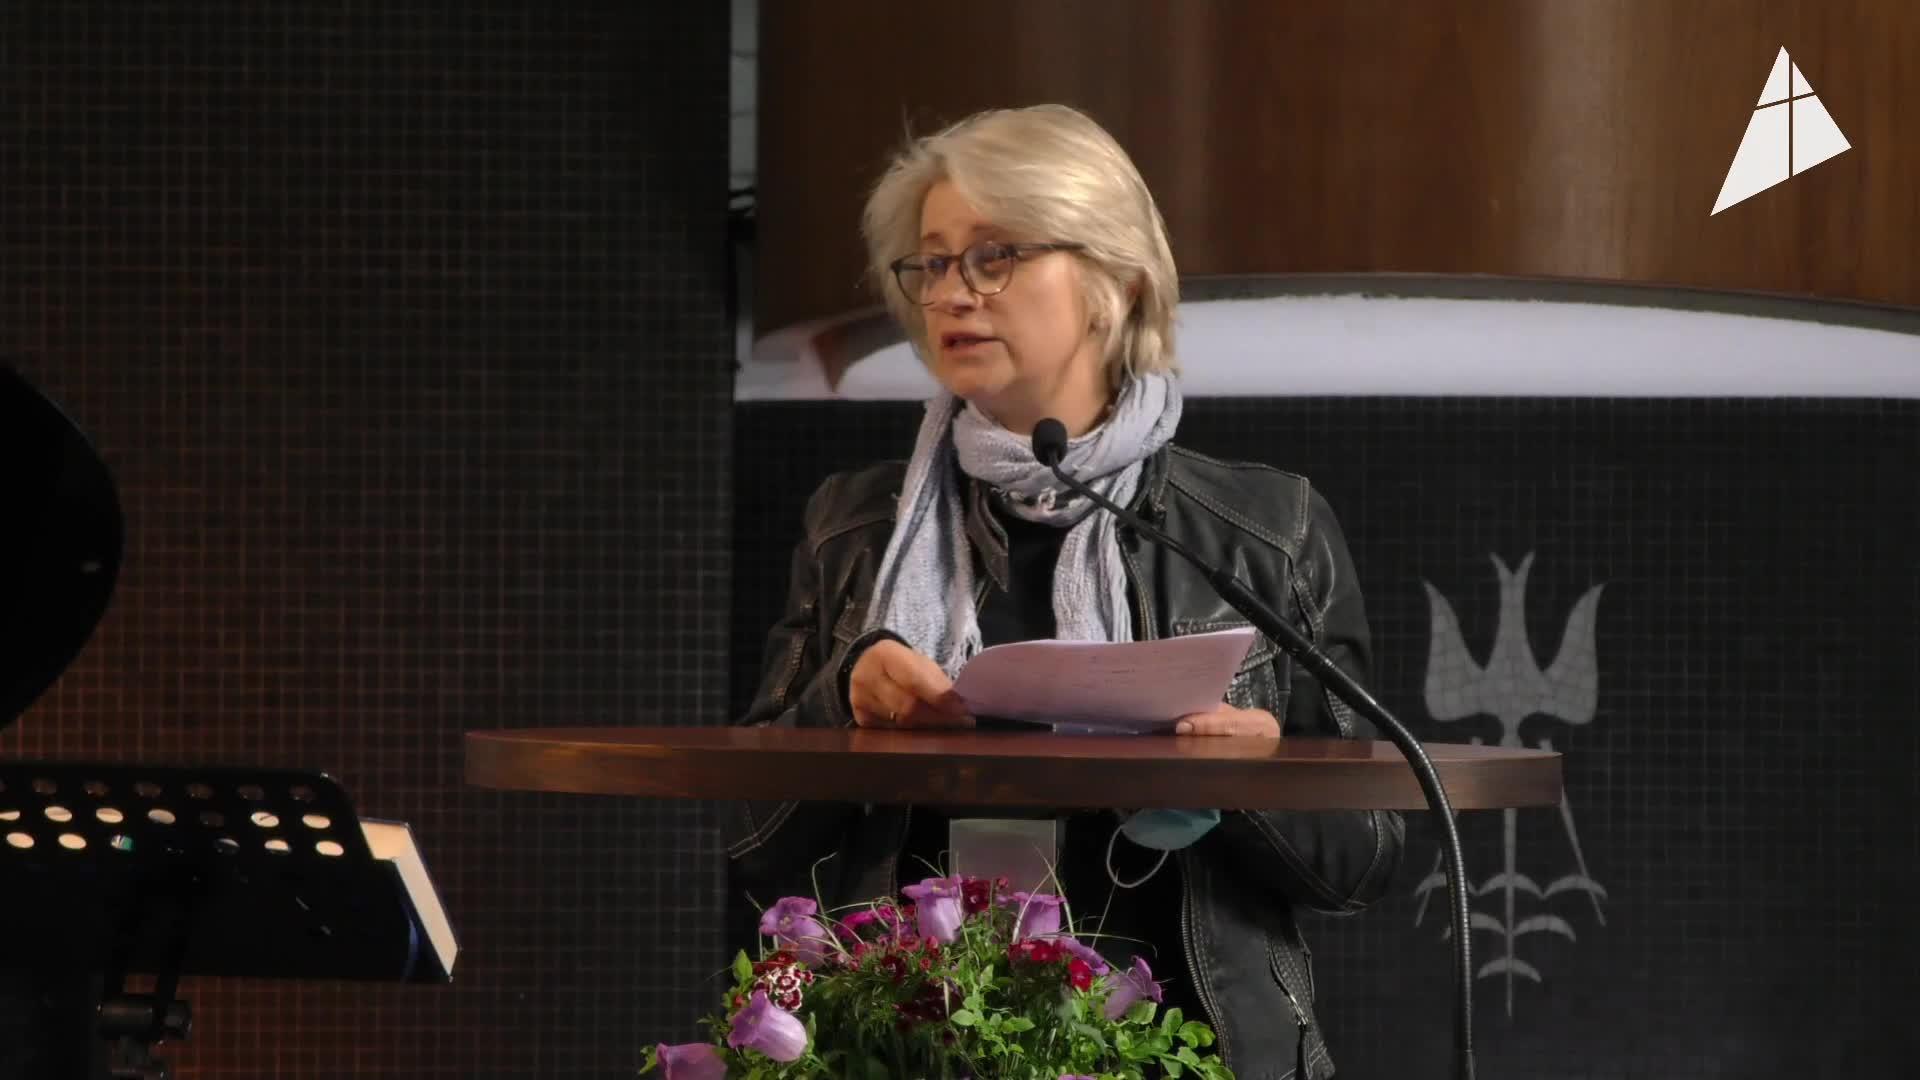 Gottesdienst - am 30. Mai - Livestream aus der Christuskirche Altona